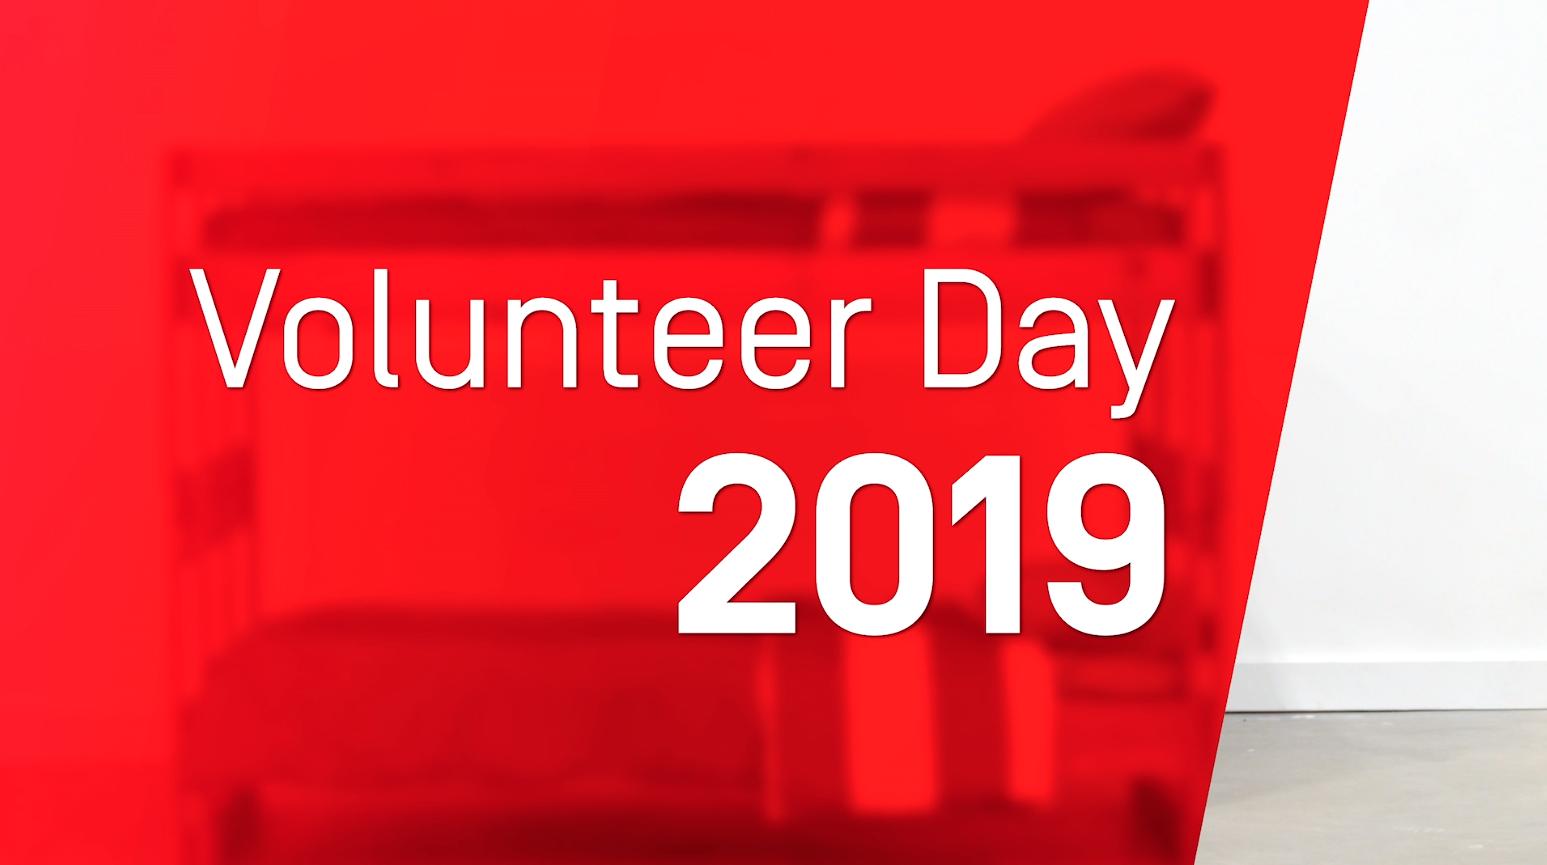 Volunteer Day 2019